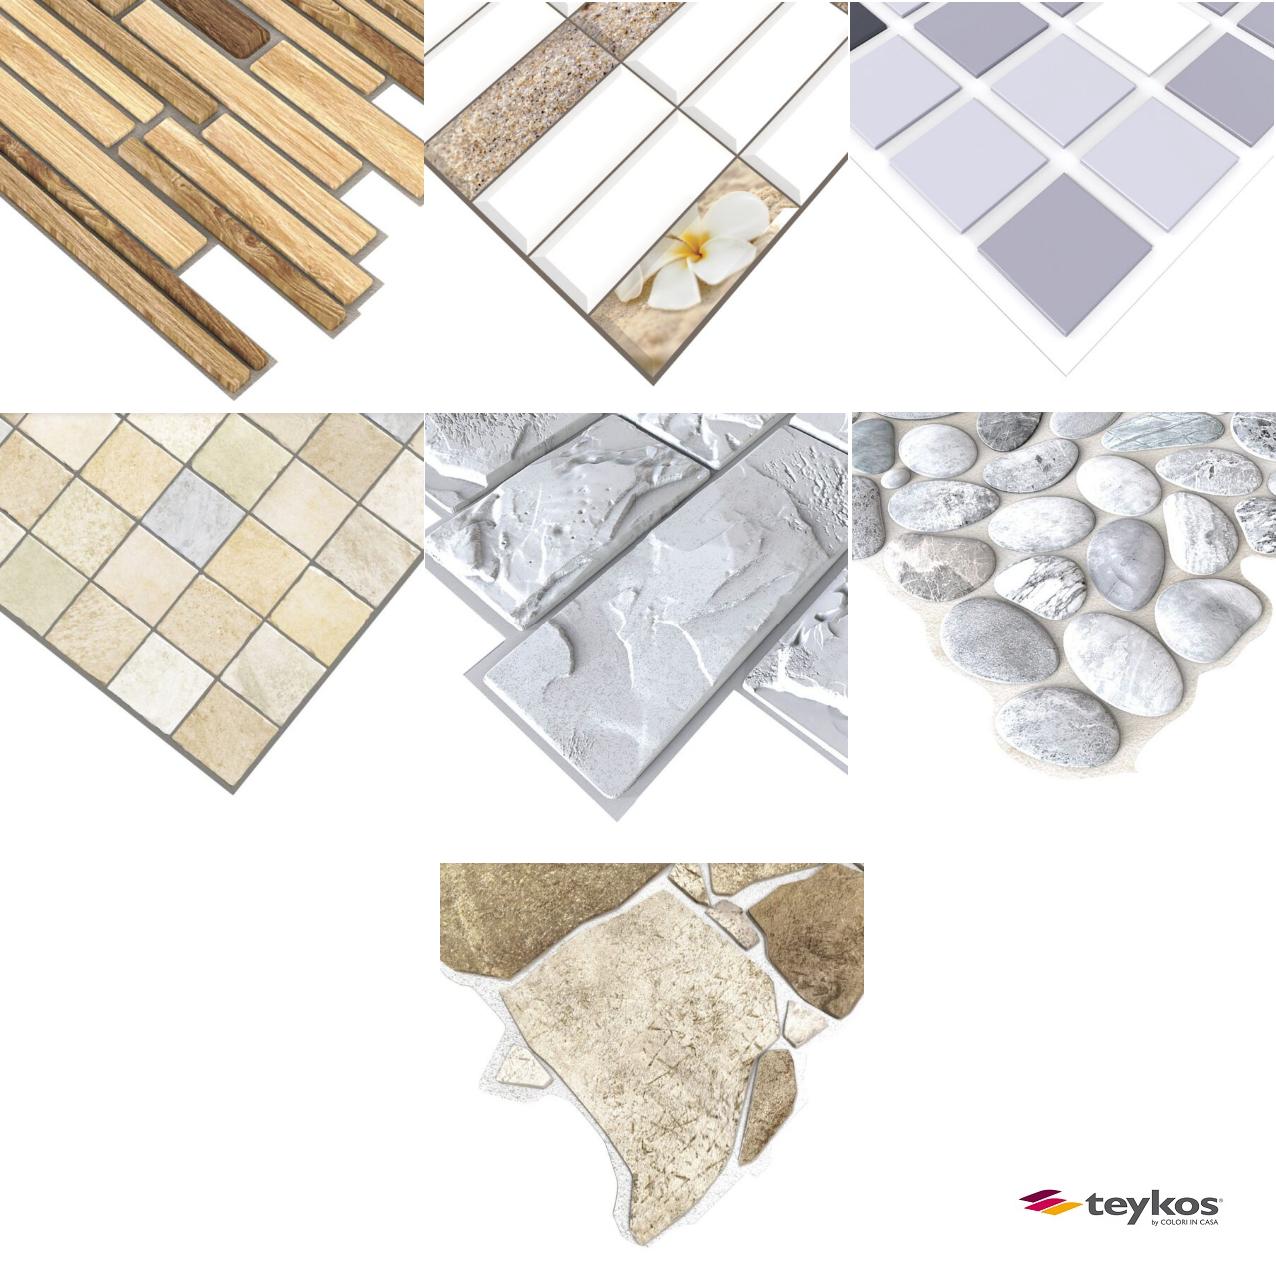 Pannello decorativo 3D in PVC vari modelli - TEYKOS